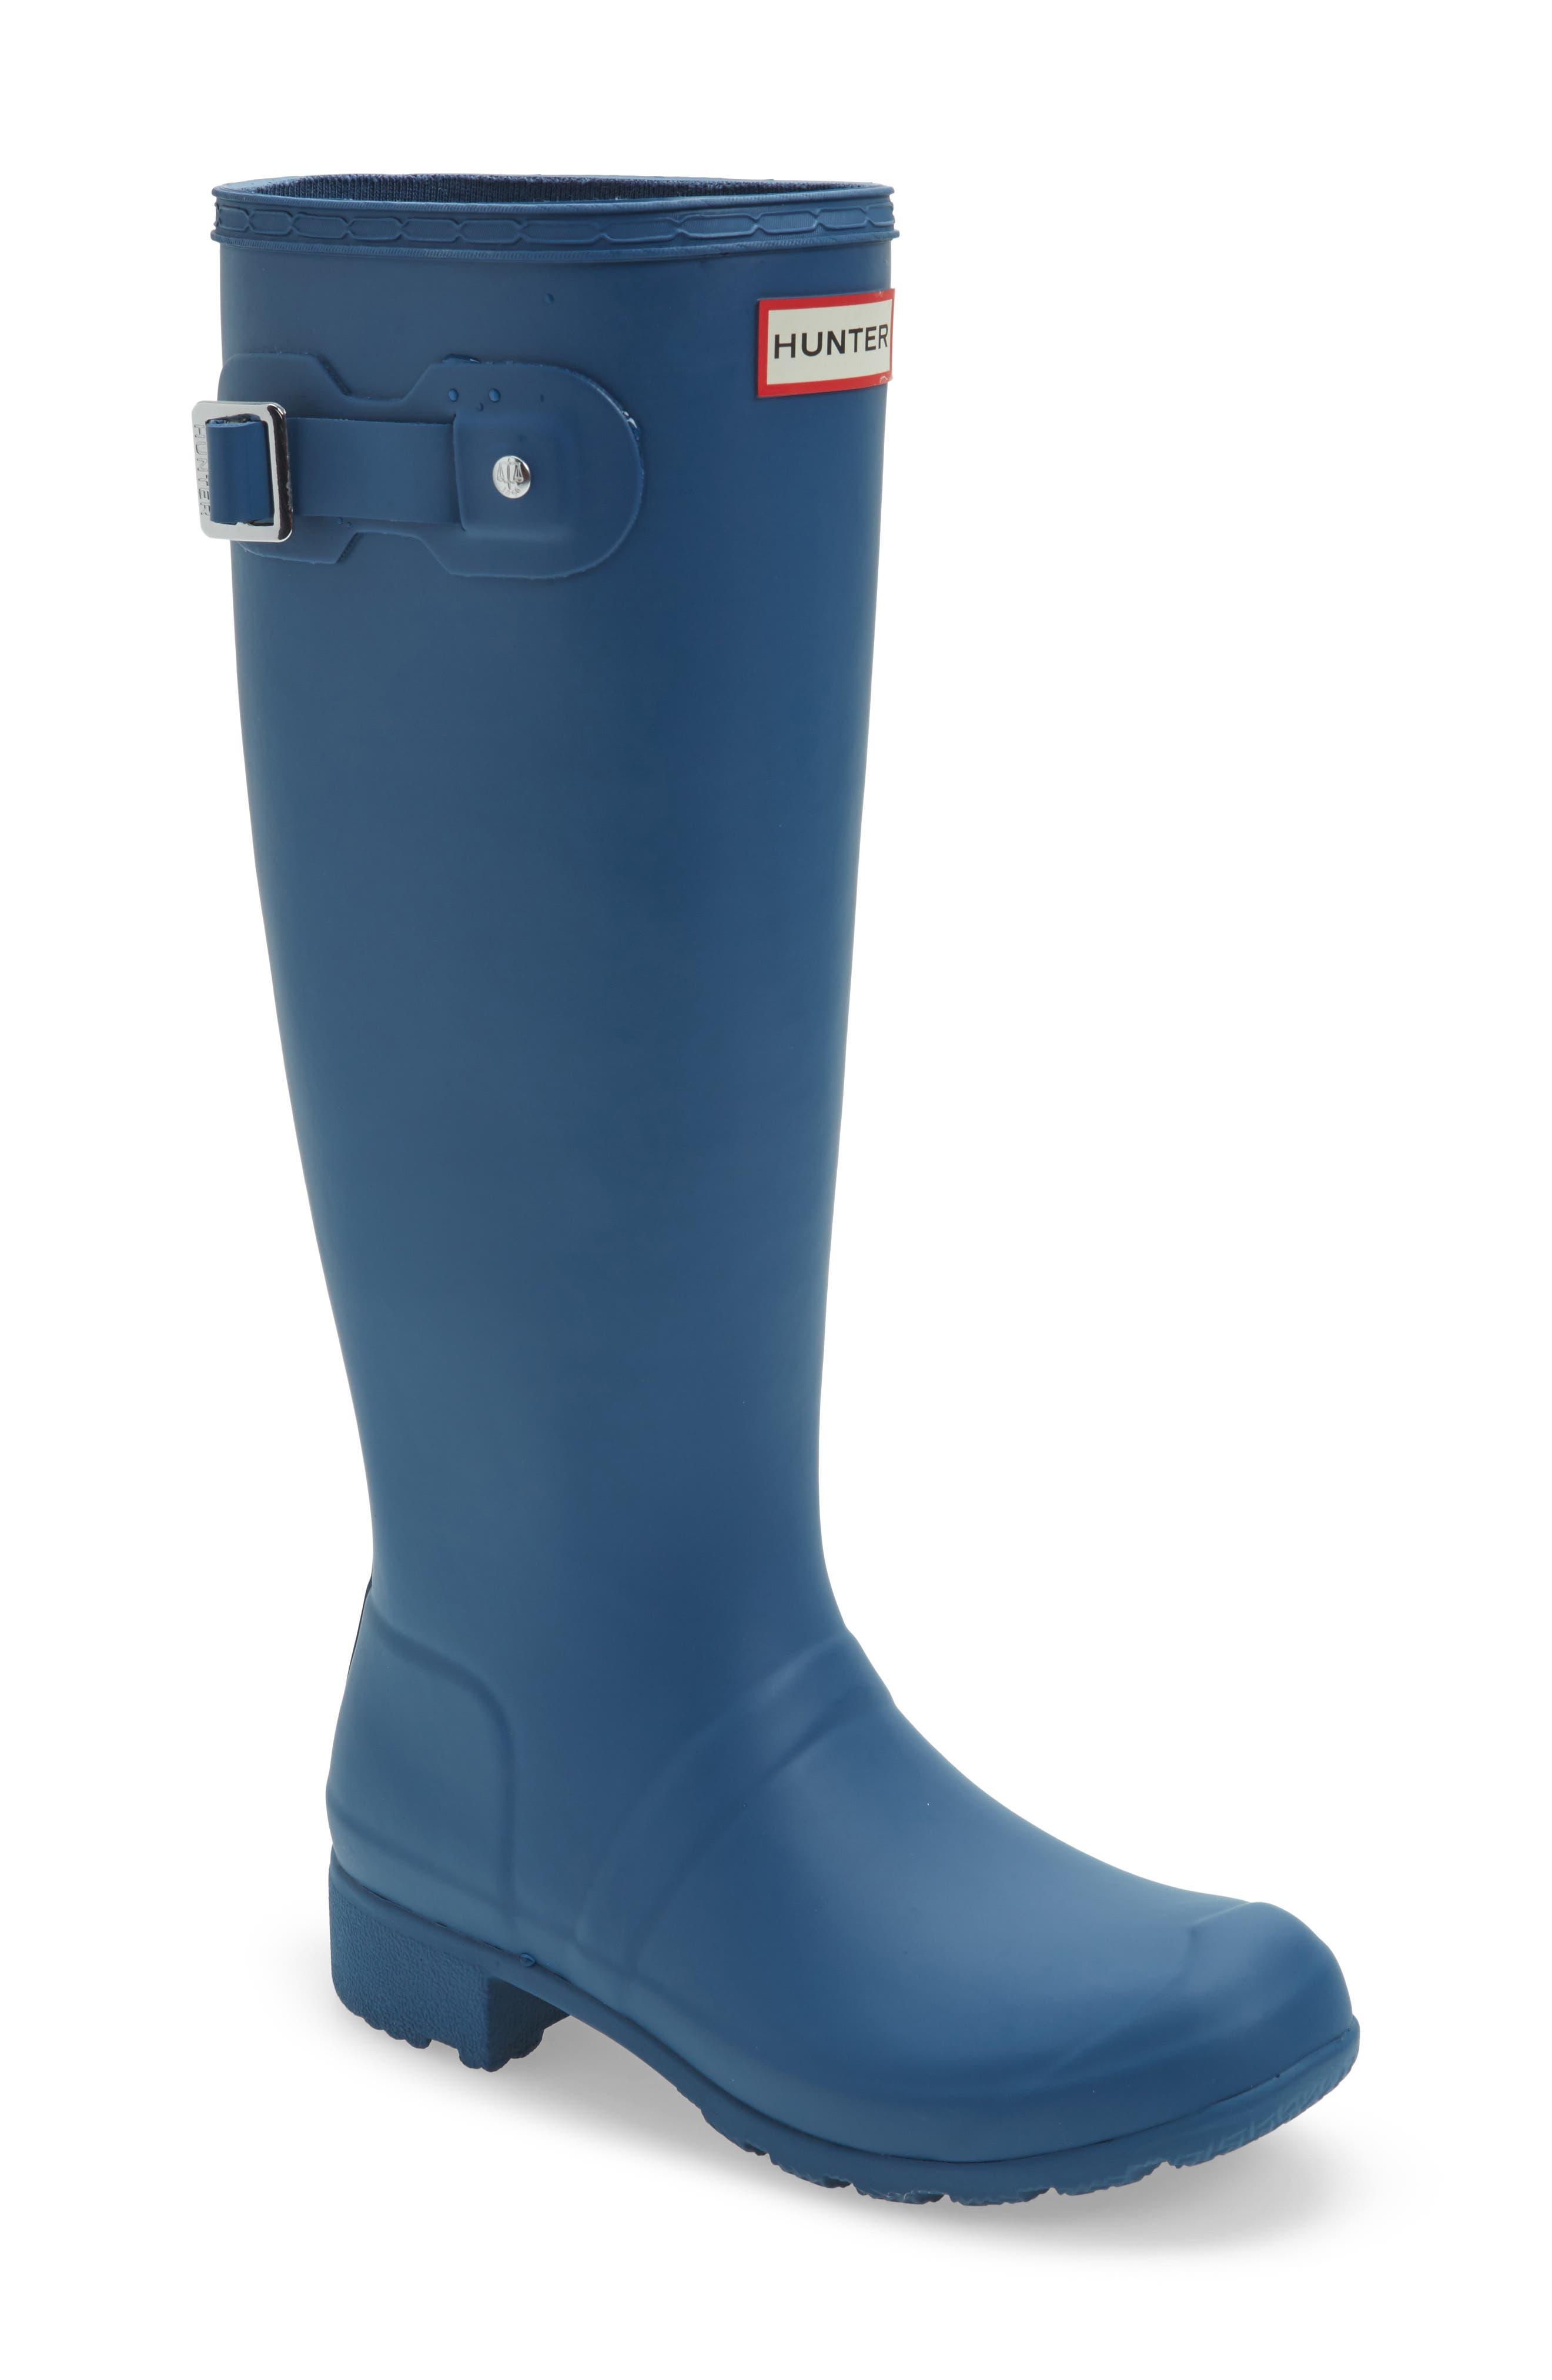 Alternate Image 1 Selected - Hunter 'Tour' Packable Rain Boot (Women)